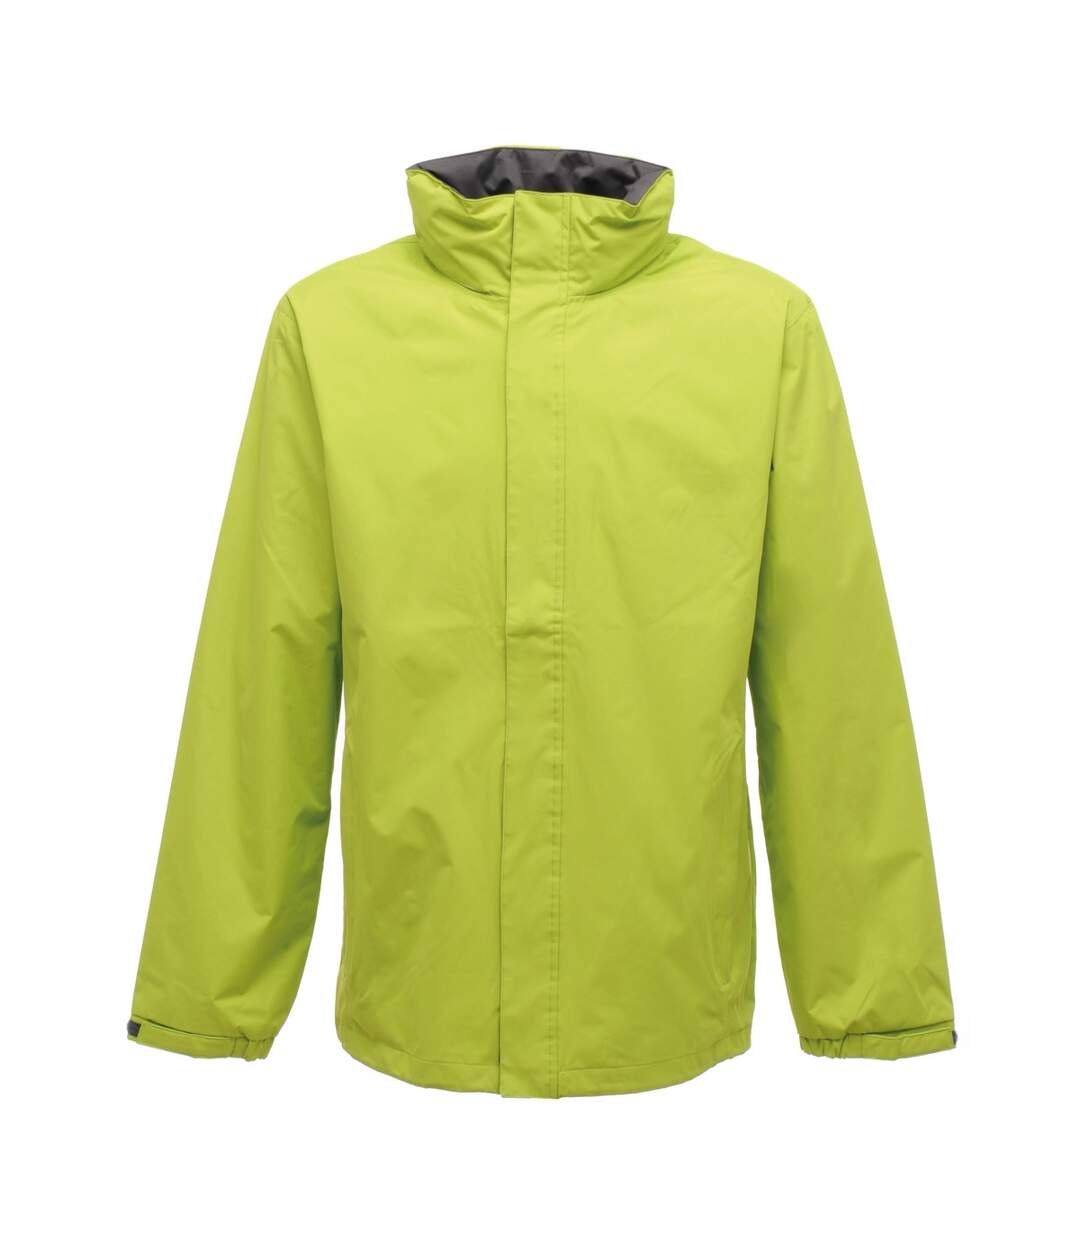 Regatta Mens Standout Ardmore Jacket (Waterproof & Windproof) (Key Lime/Seal Grey) - UTRG1603